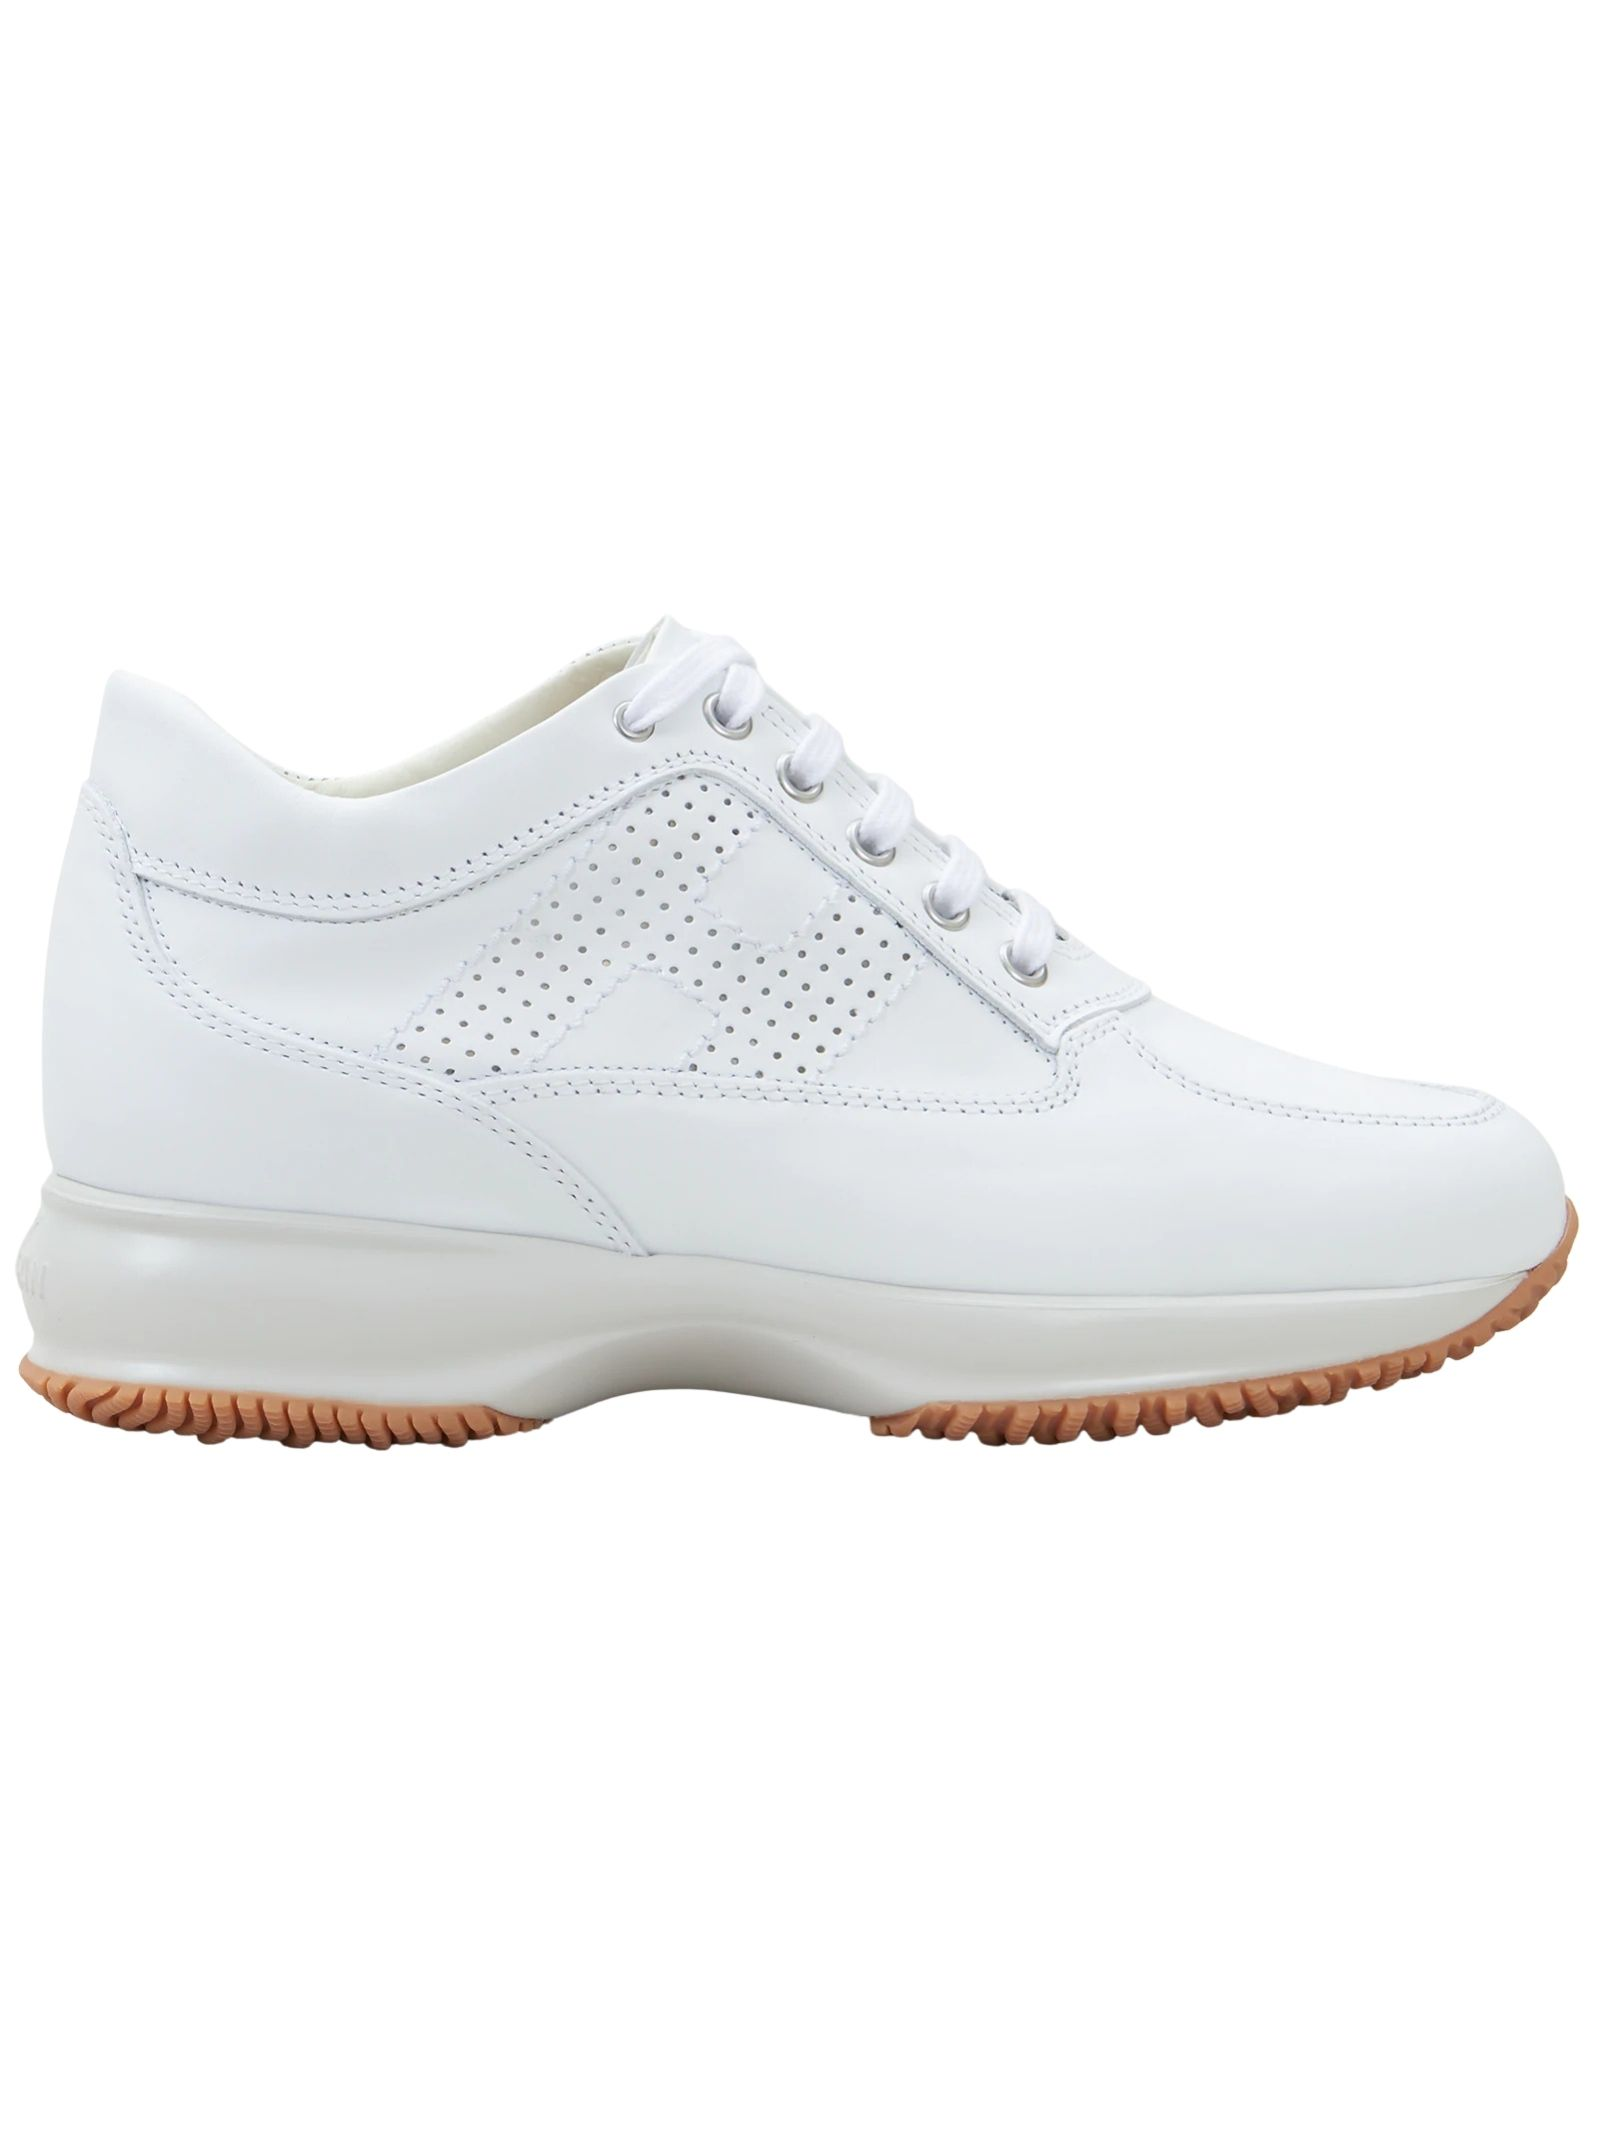 Sneakers Interactive HOGAN | Scarpe | HXW00N00E30KLAB001